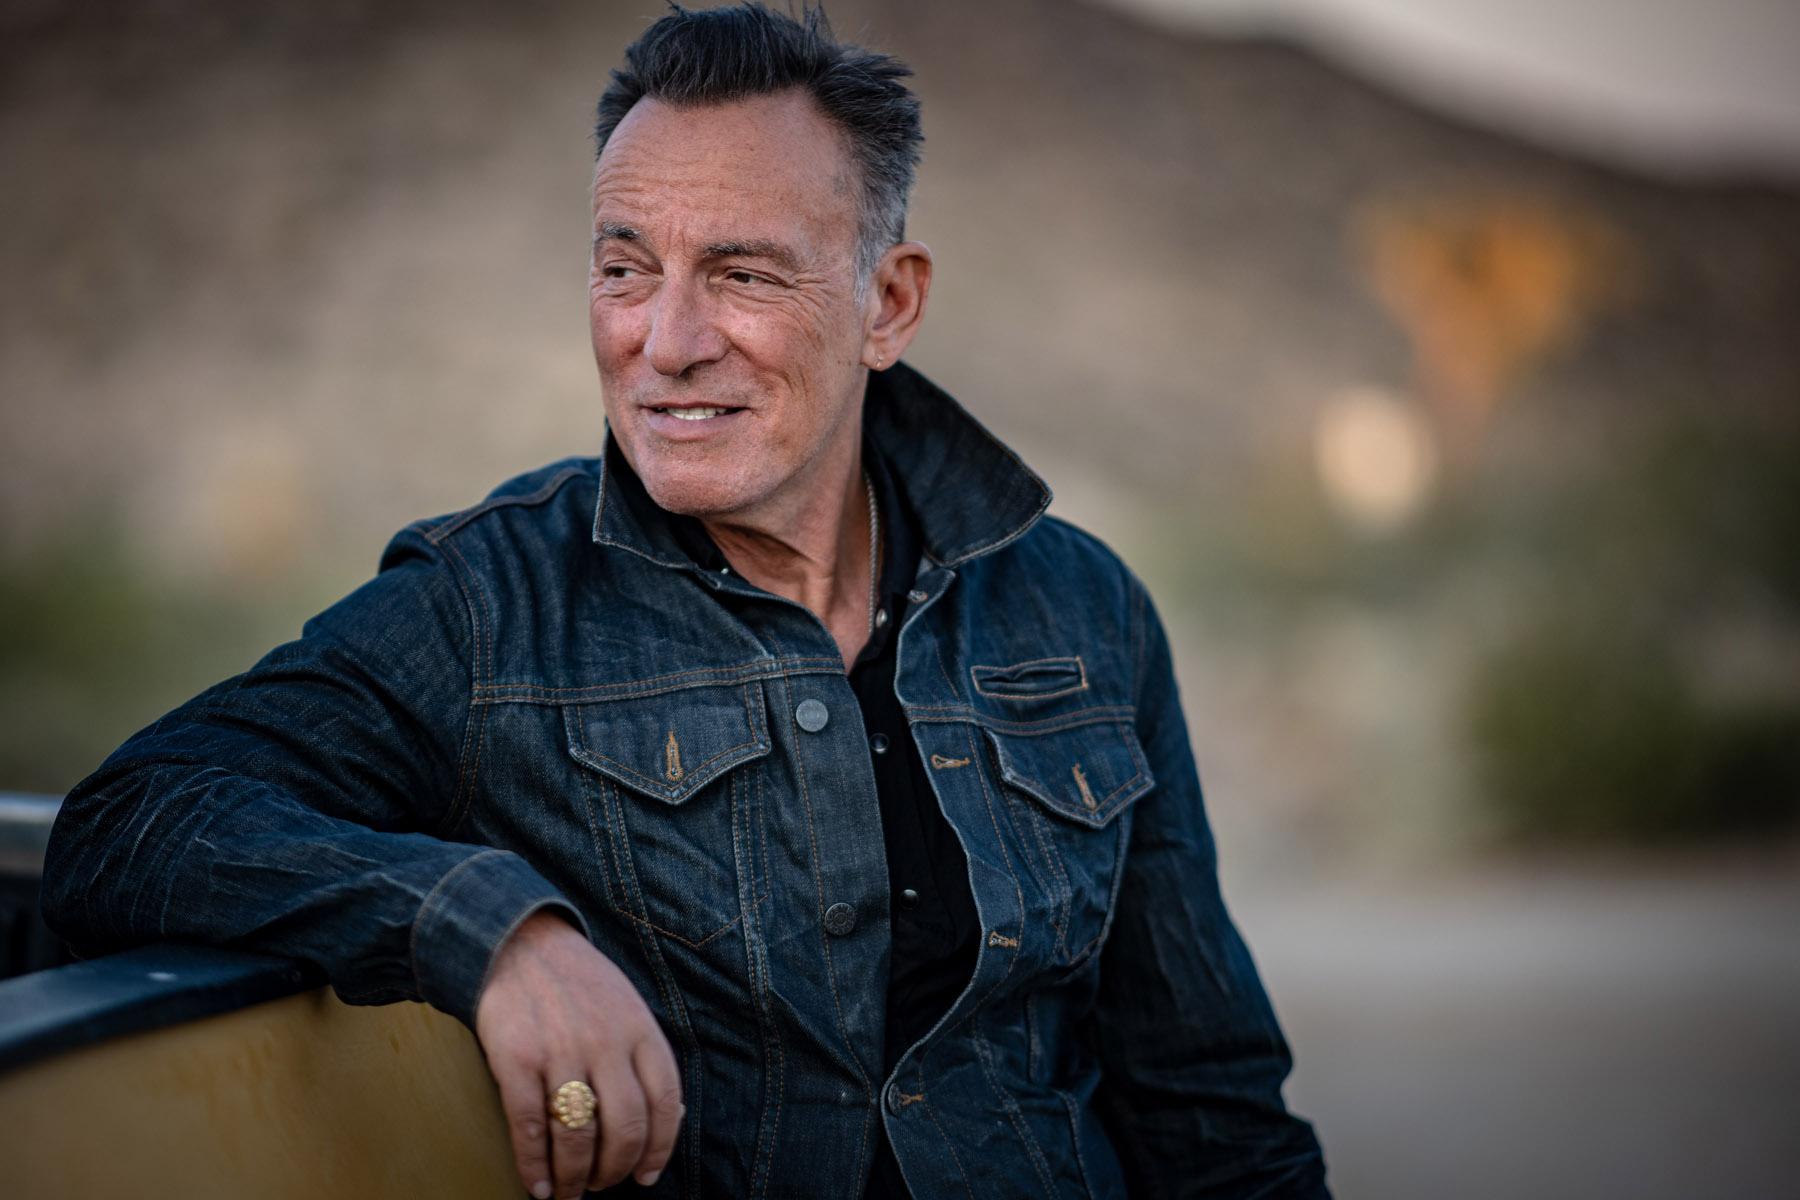 Bruce Springsteen Biography